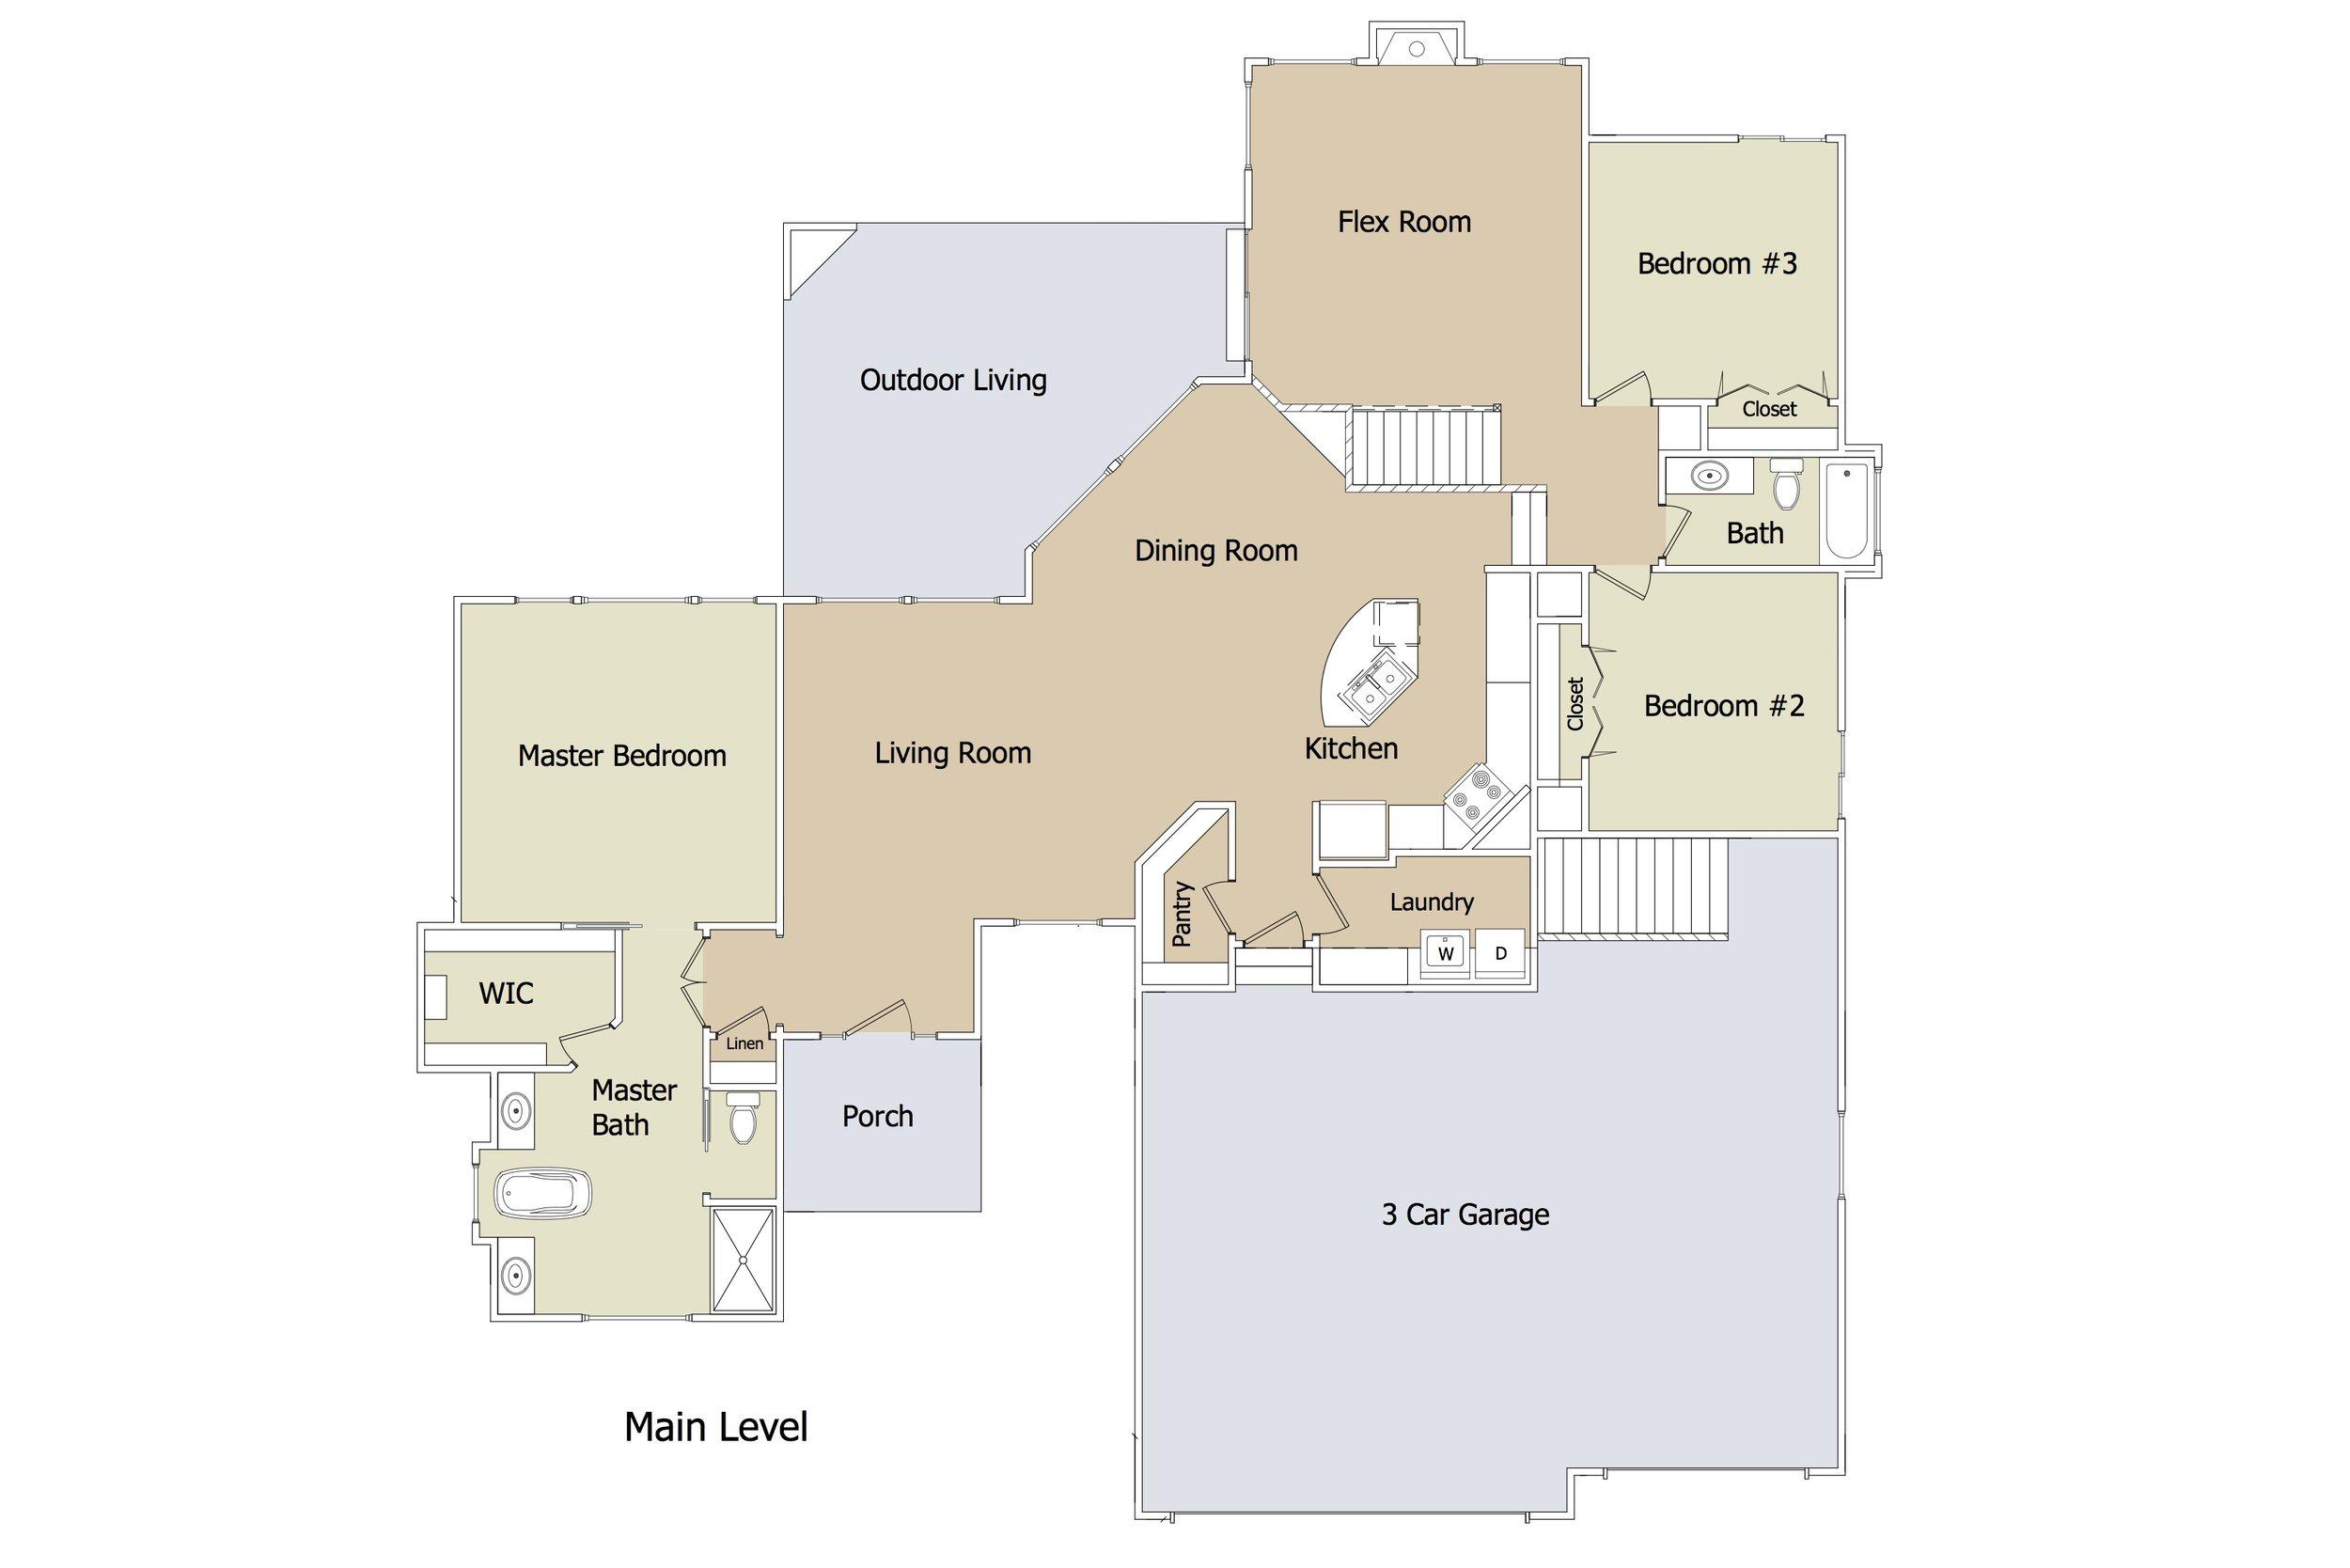 6305 W. Driftwood.JLRUSSELL.Floorplan.ML.jpg